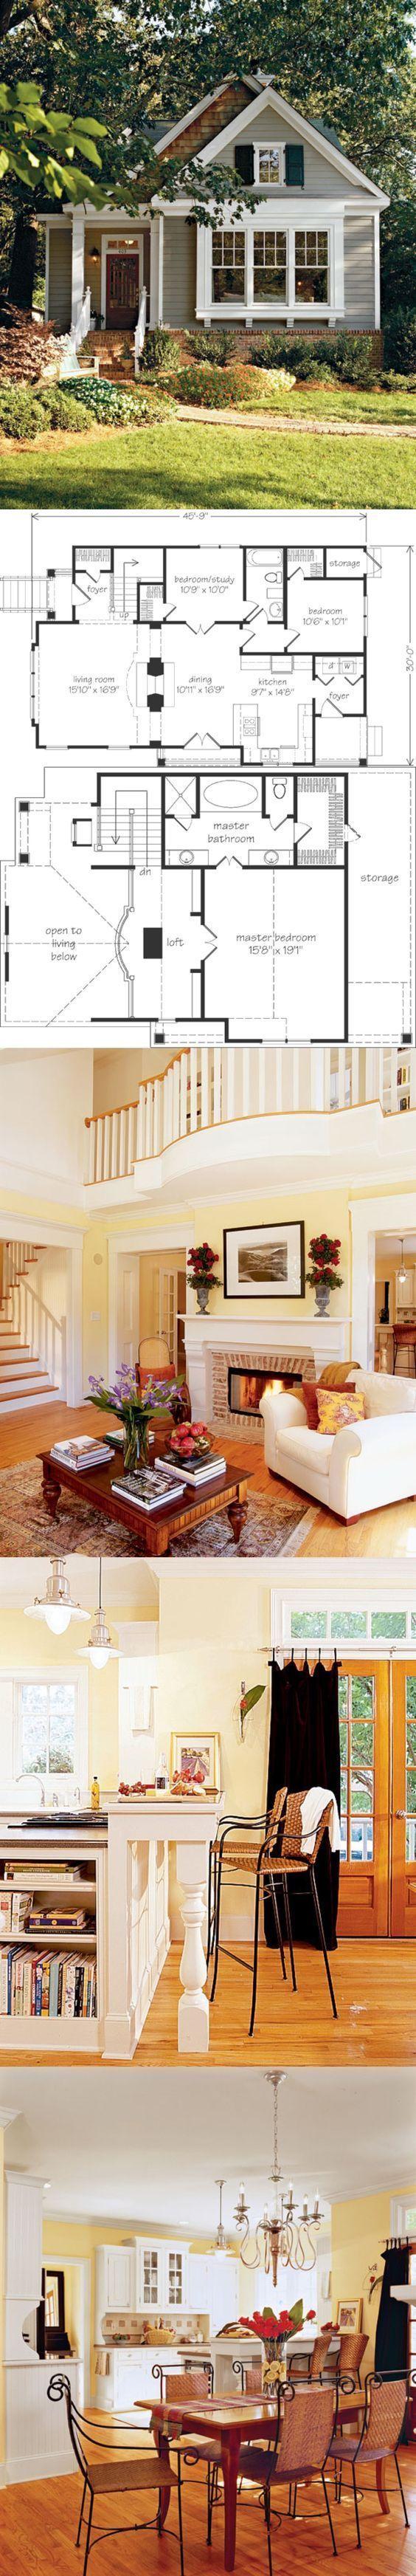 Beautiful Small House Floor Plan Inspiration Decor Floorplan